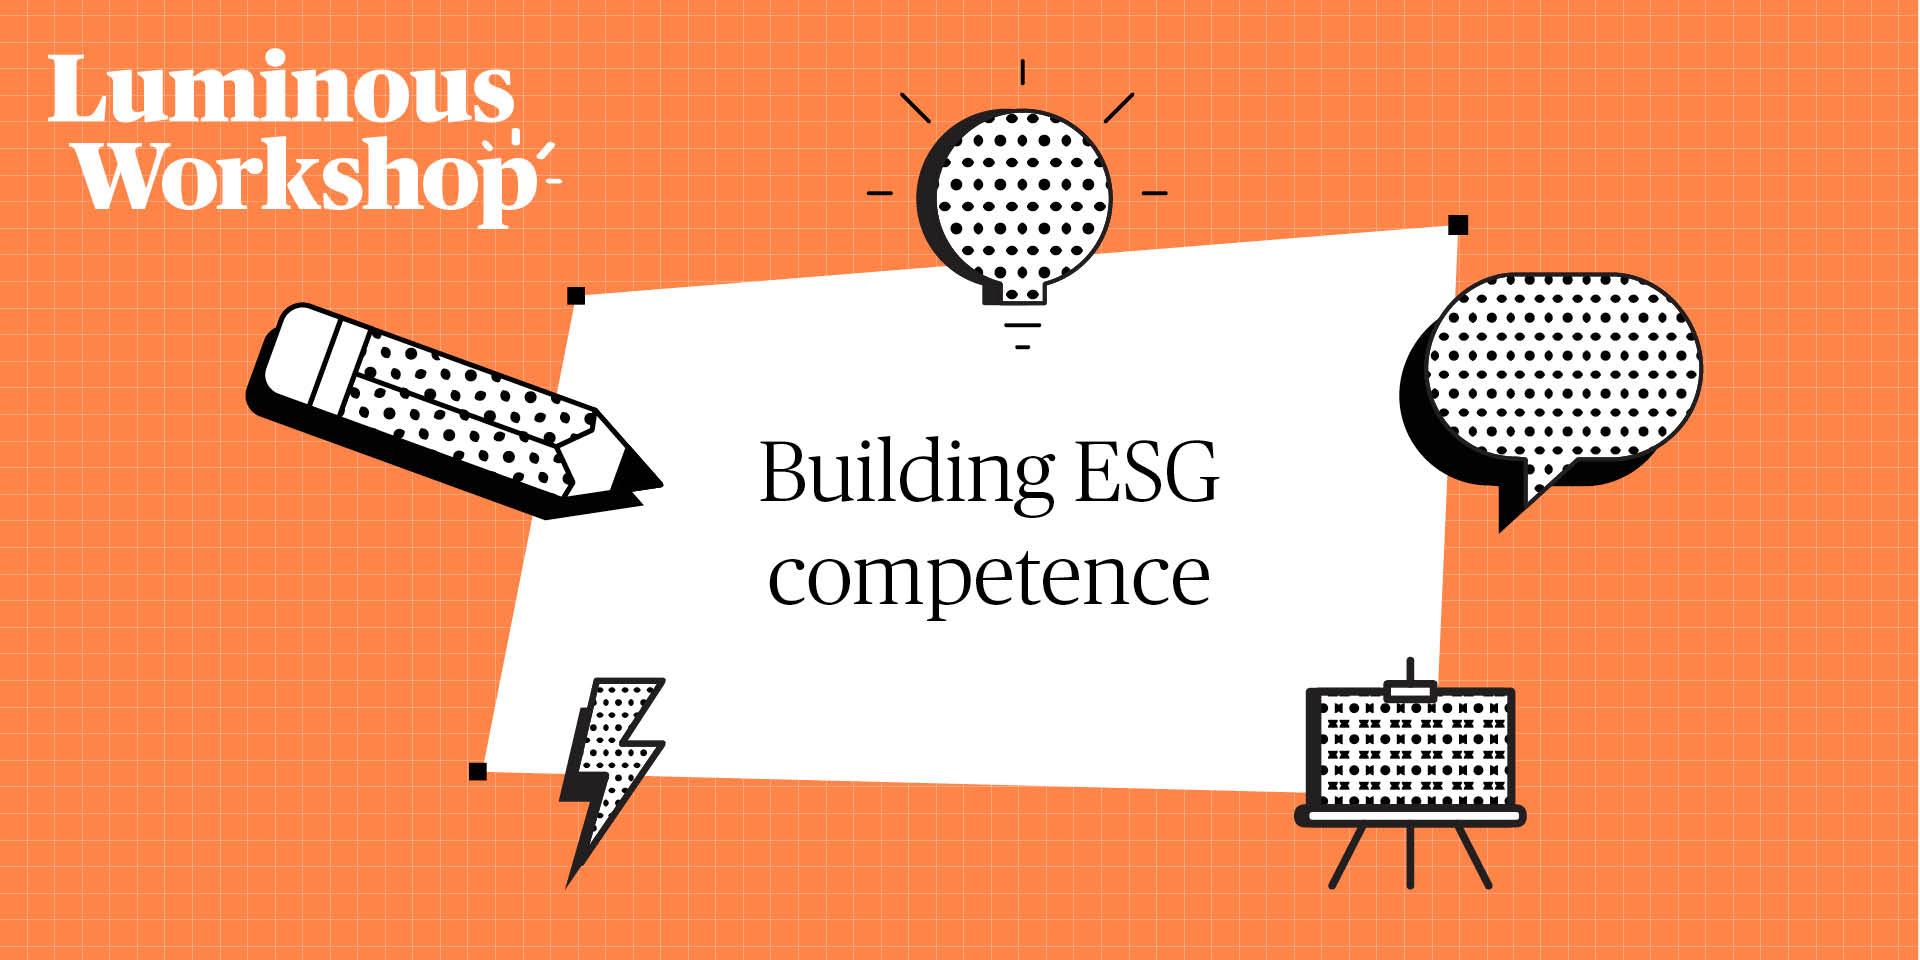 Luminous workshop on building ESG competence